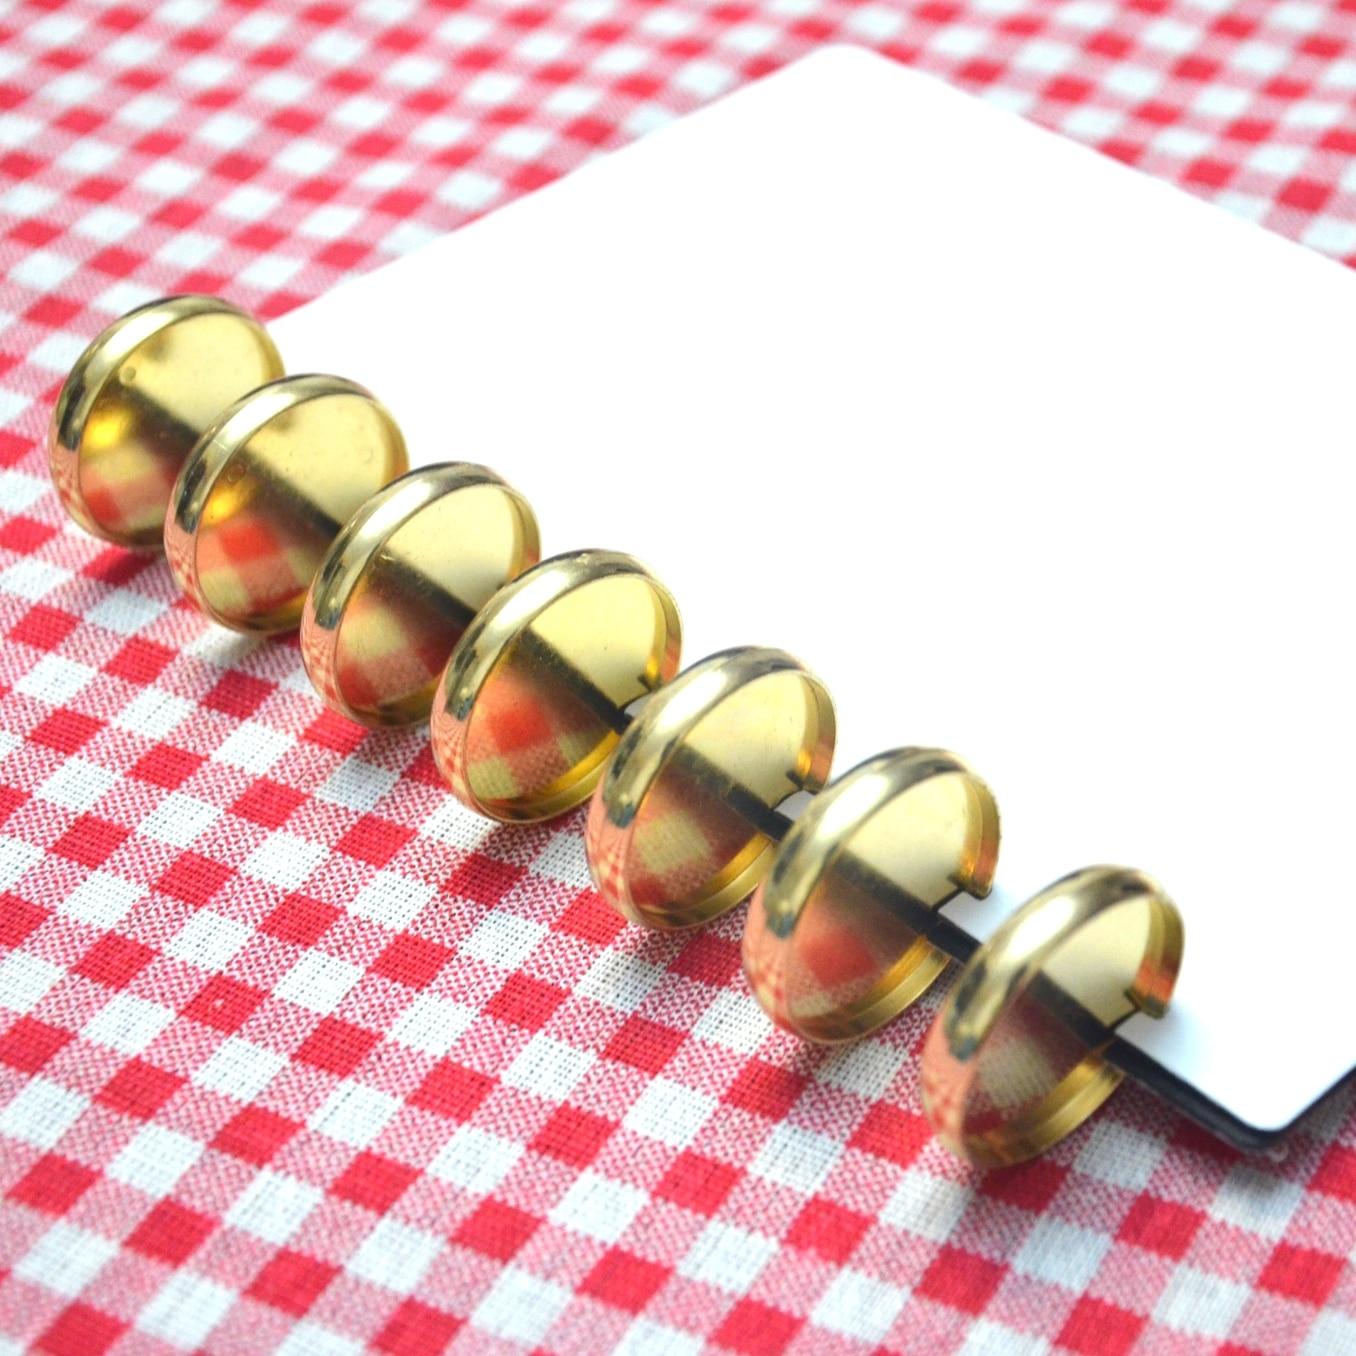 12pcs 35mm Disc Binding A4 Binder Ring For Notebook Paper Ring Planner Ring Binder Mushroom Hole Binder Gold Binding Discs